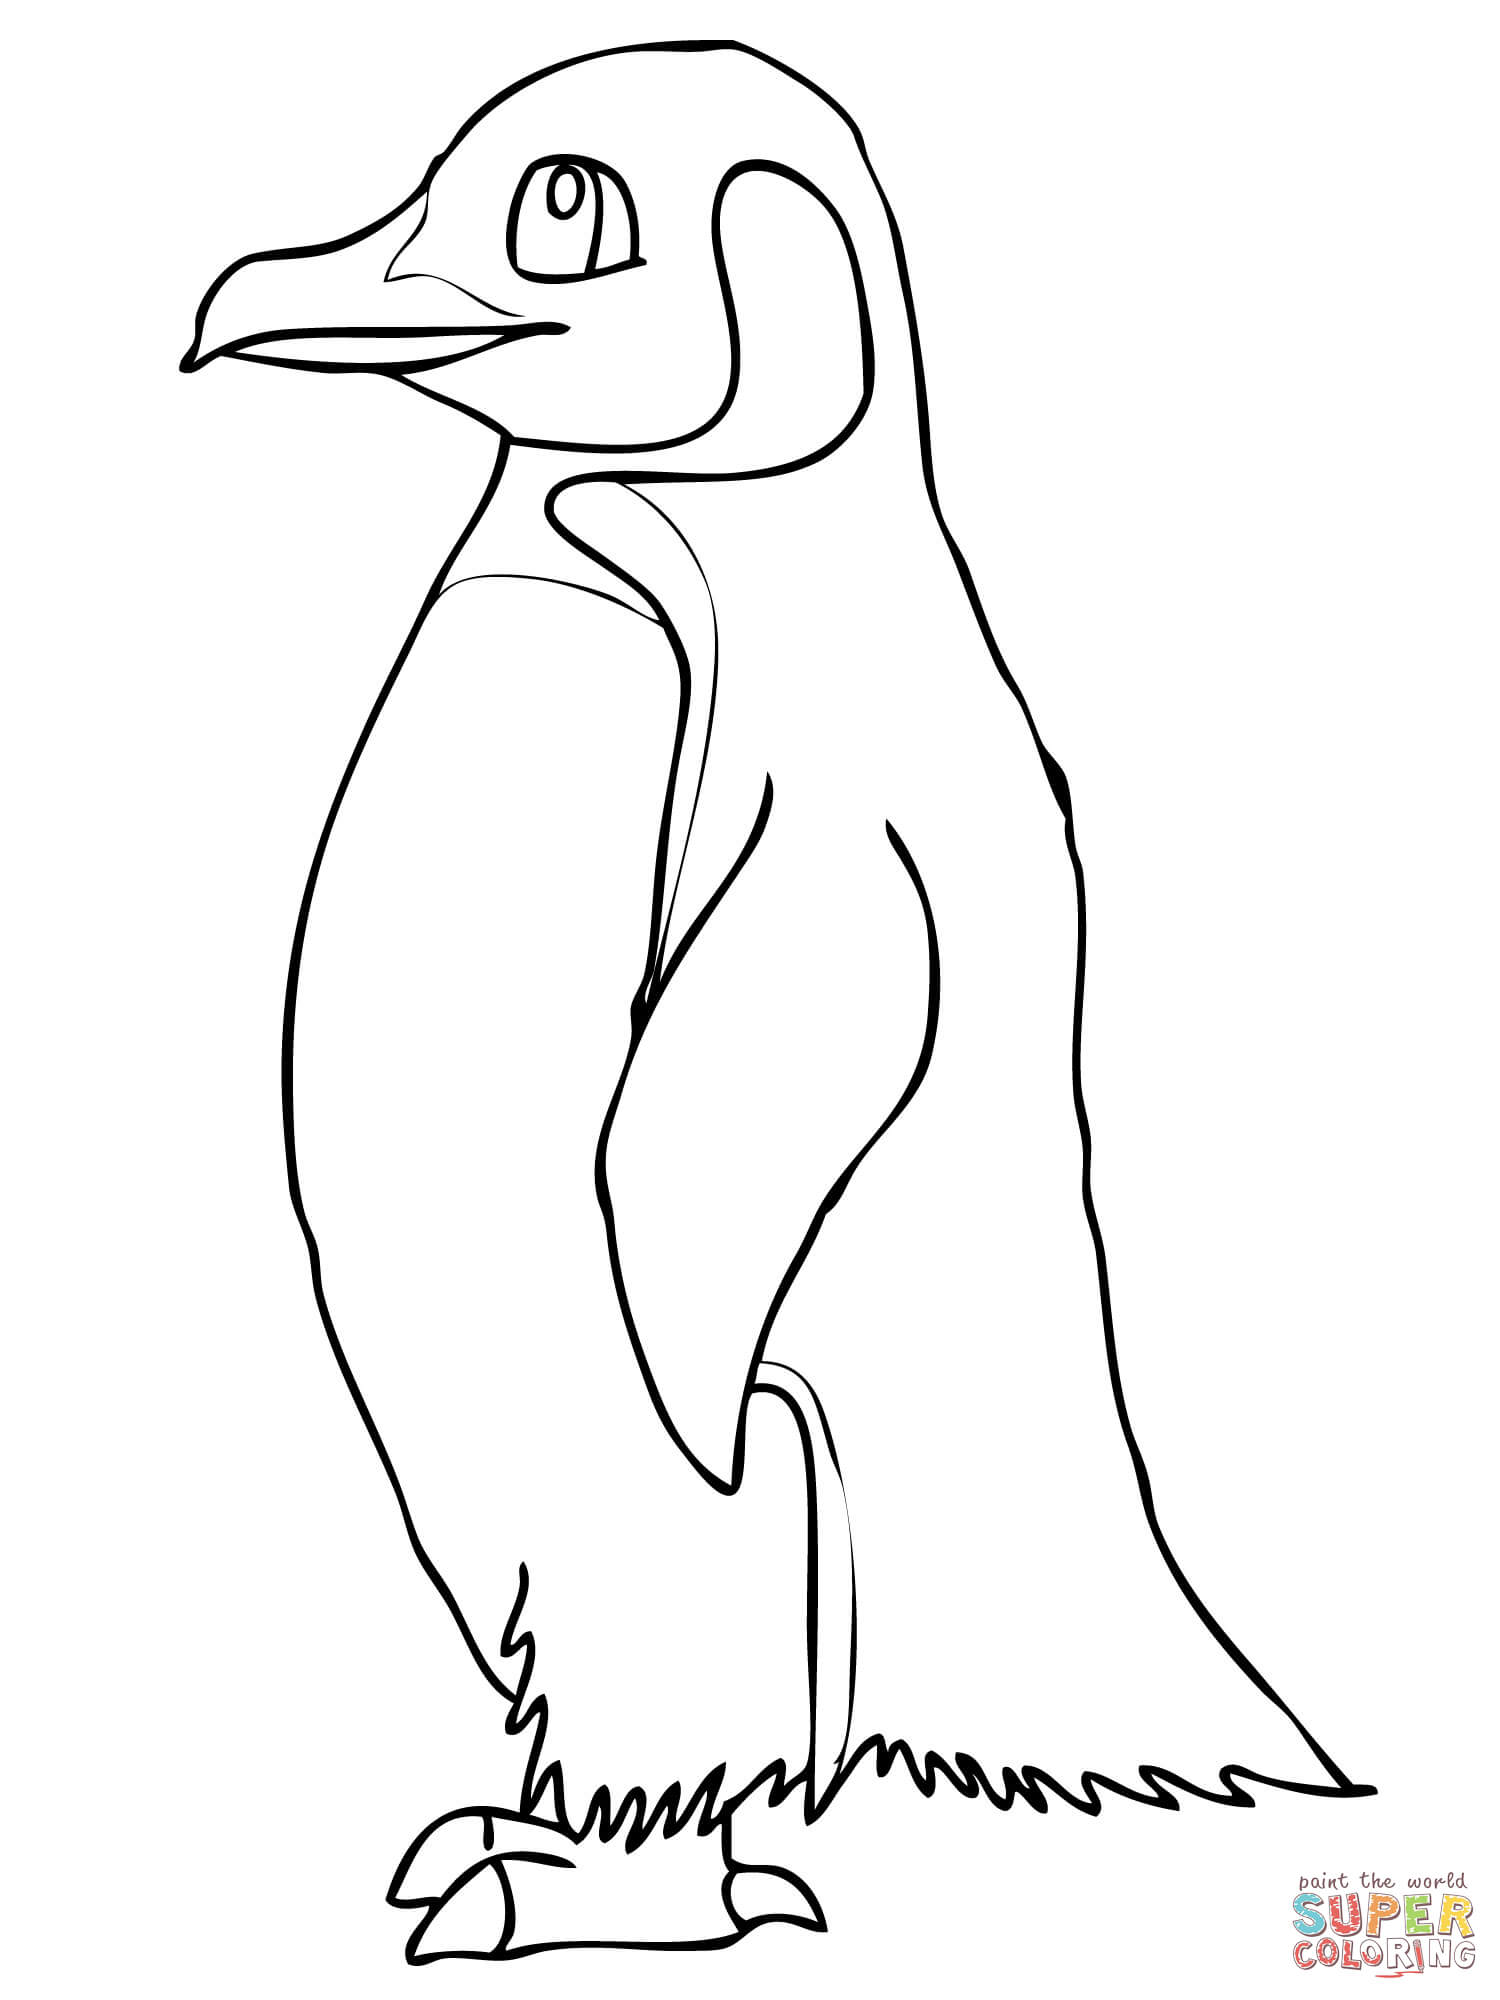 King Emperor Penguins coloring #4, Download drawings